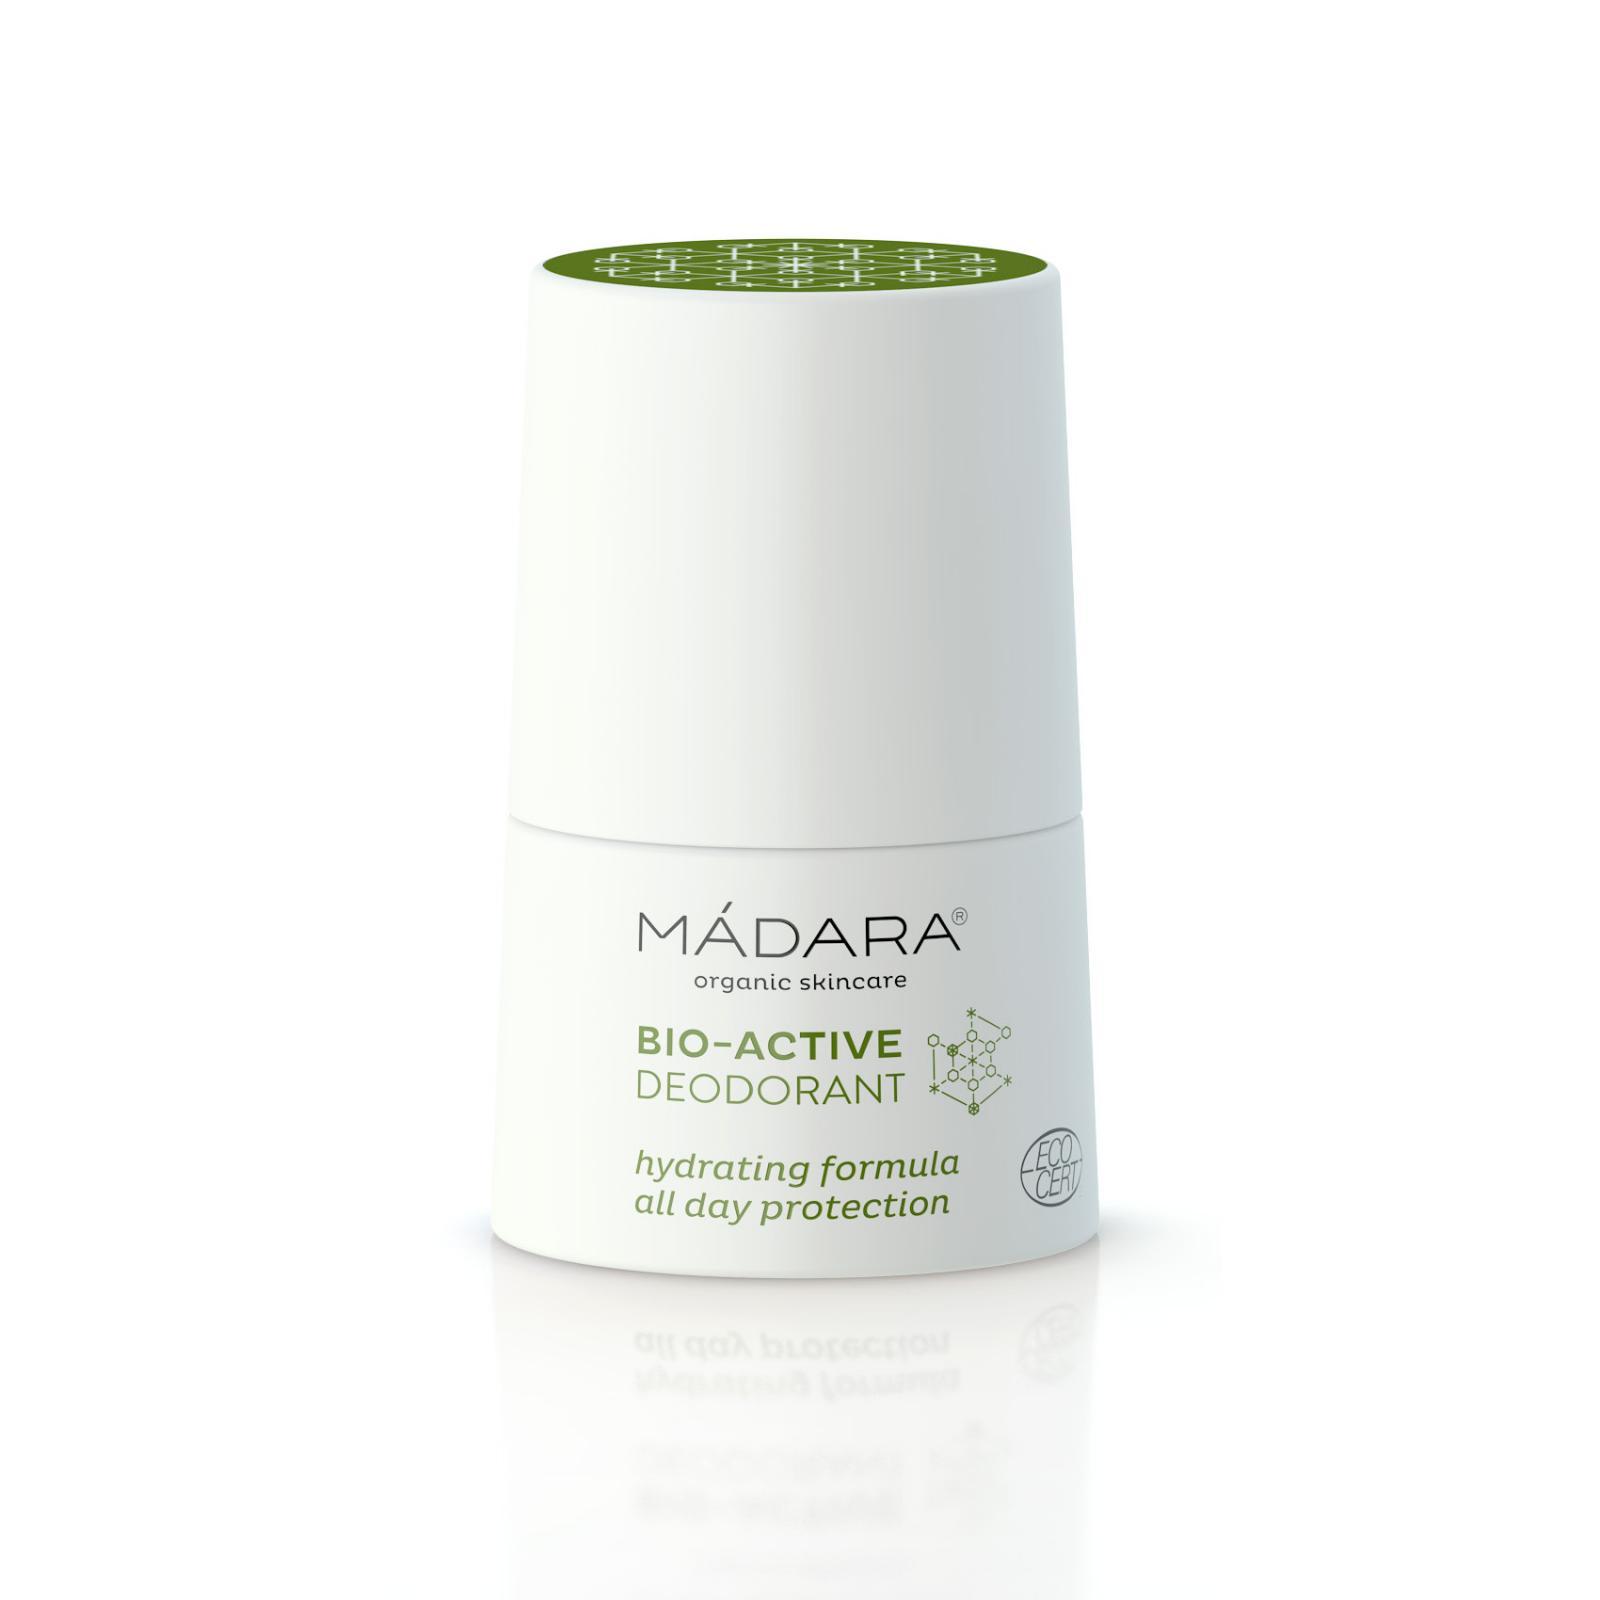 Mádara Deodorant bioaktivní 50 ml